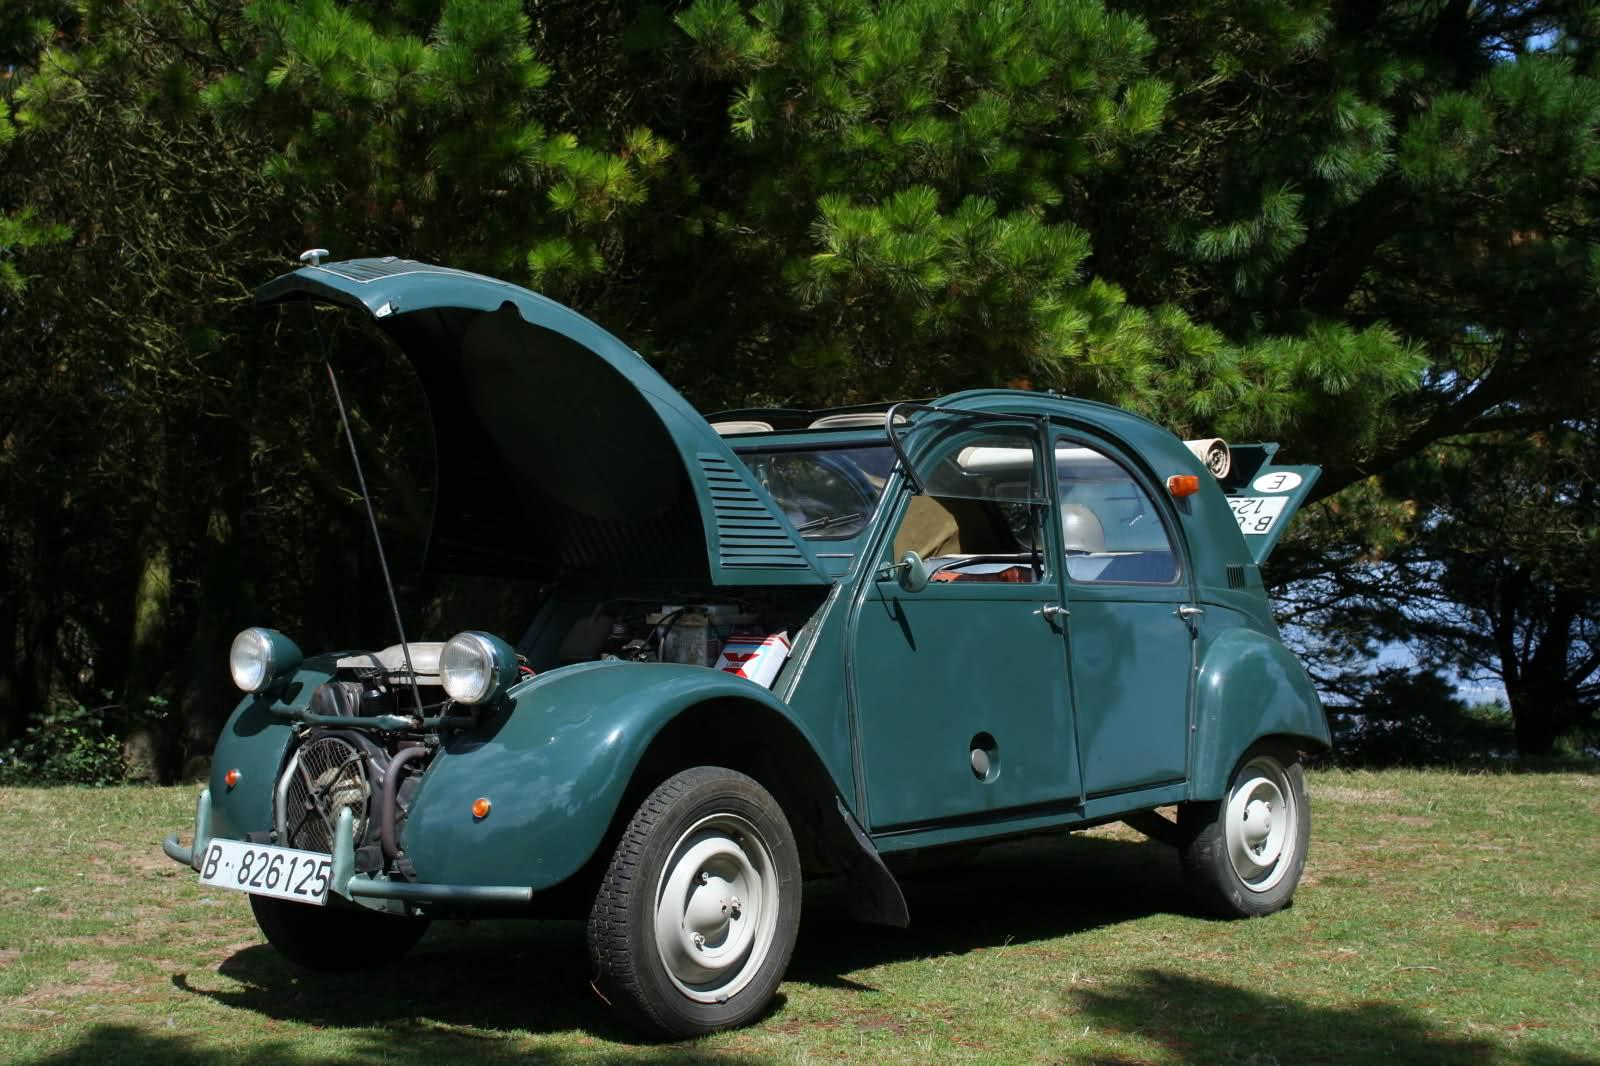 coches con historia un citro n 2cv con 2 motores citro n 2cv sahara 4x4. Black Bedroom Furniture Sets. Home Design Ideas